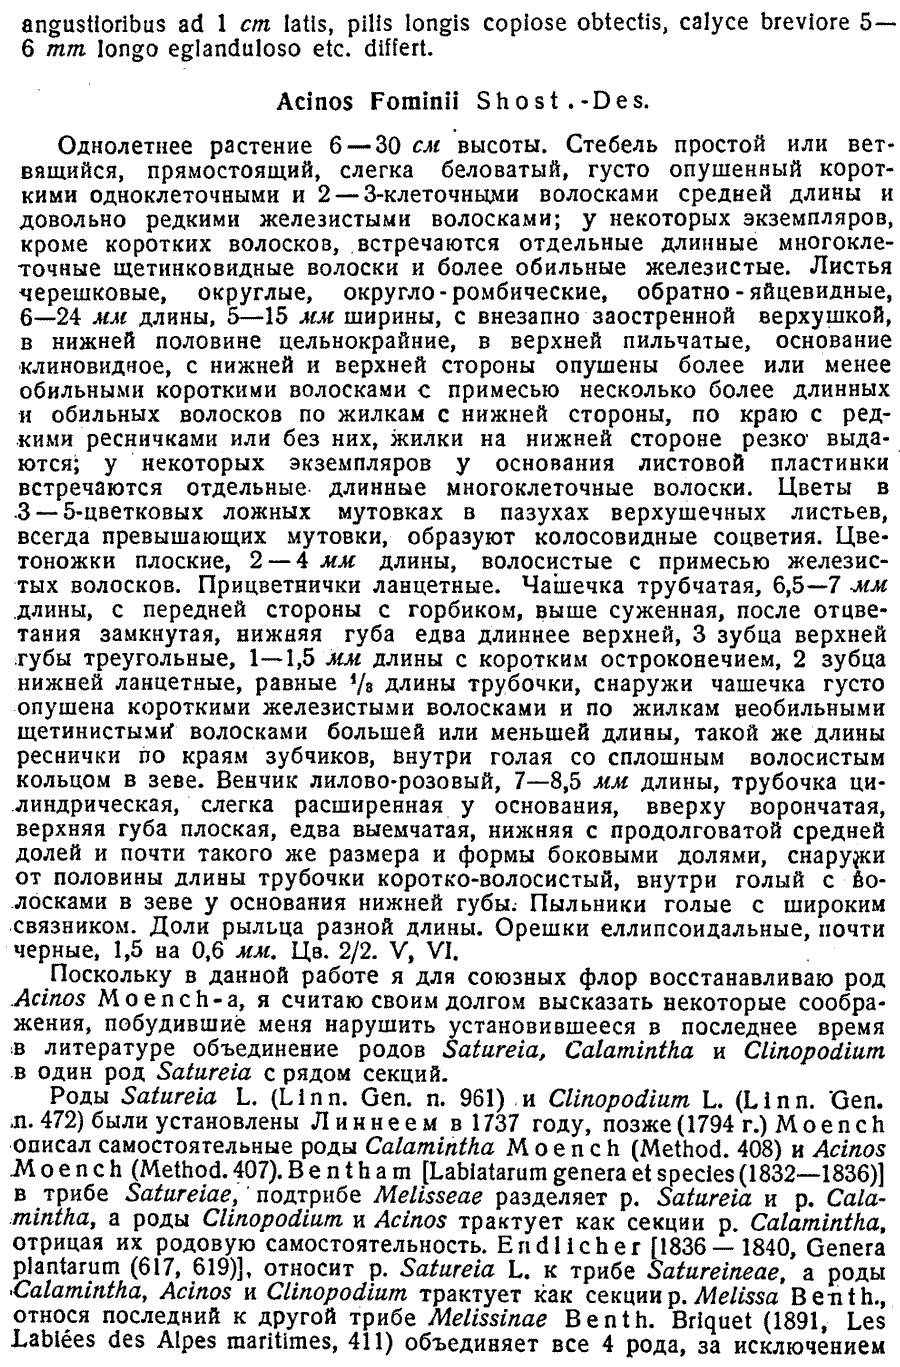 http://forum.plantarium.ru/misc.php?action=pun_attachment&item=25249